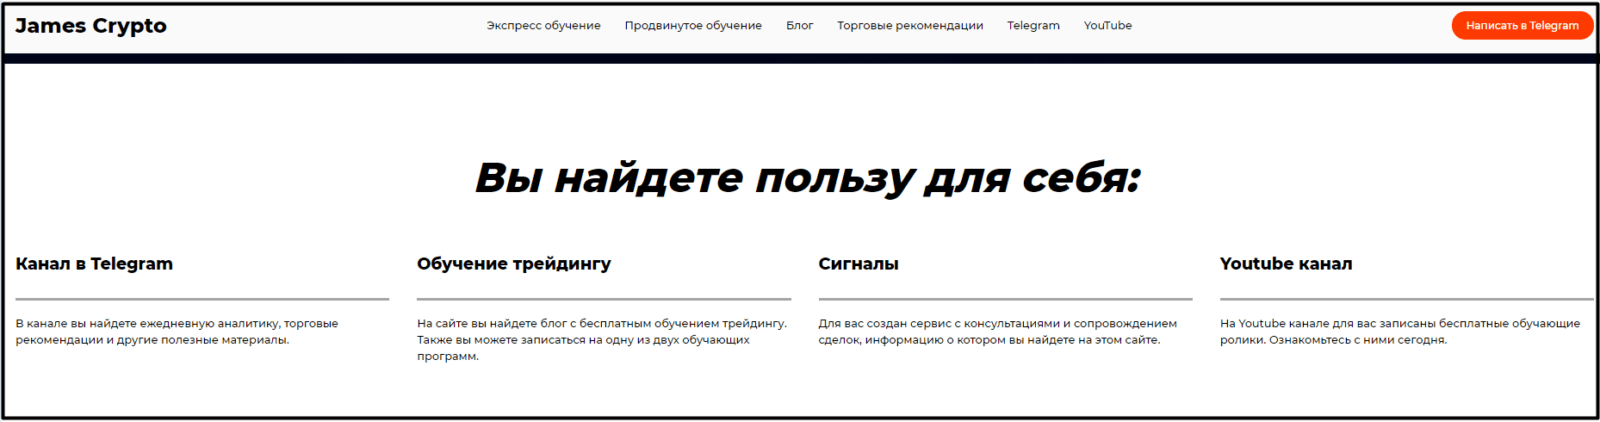 james crypto сайт